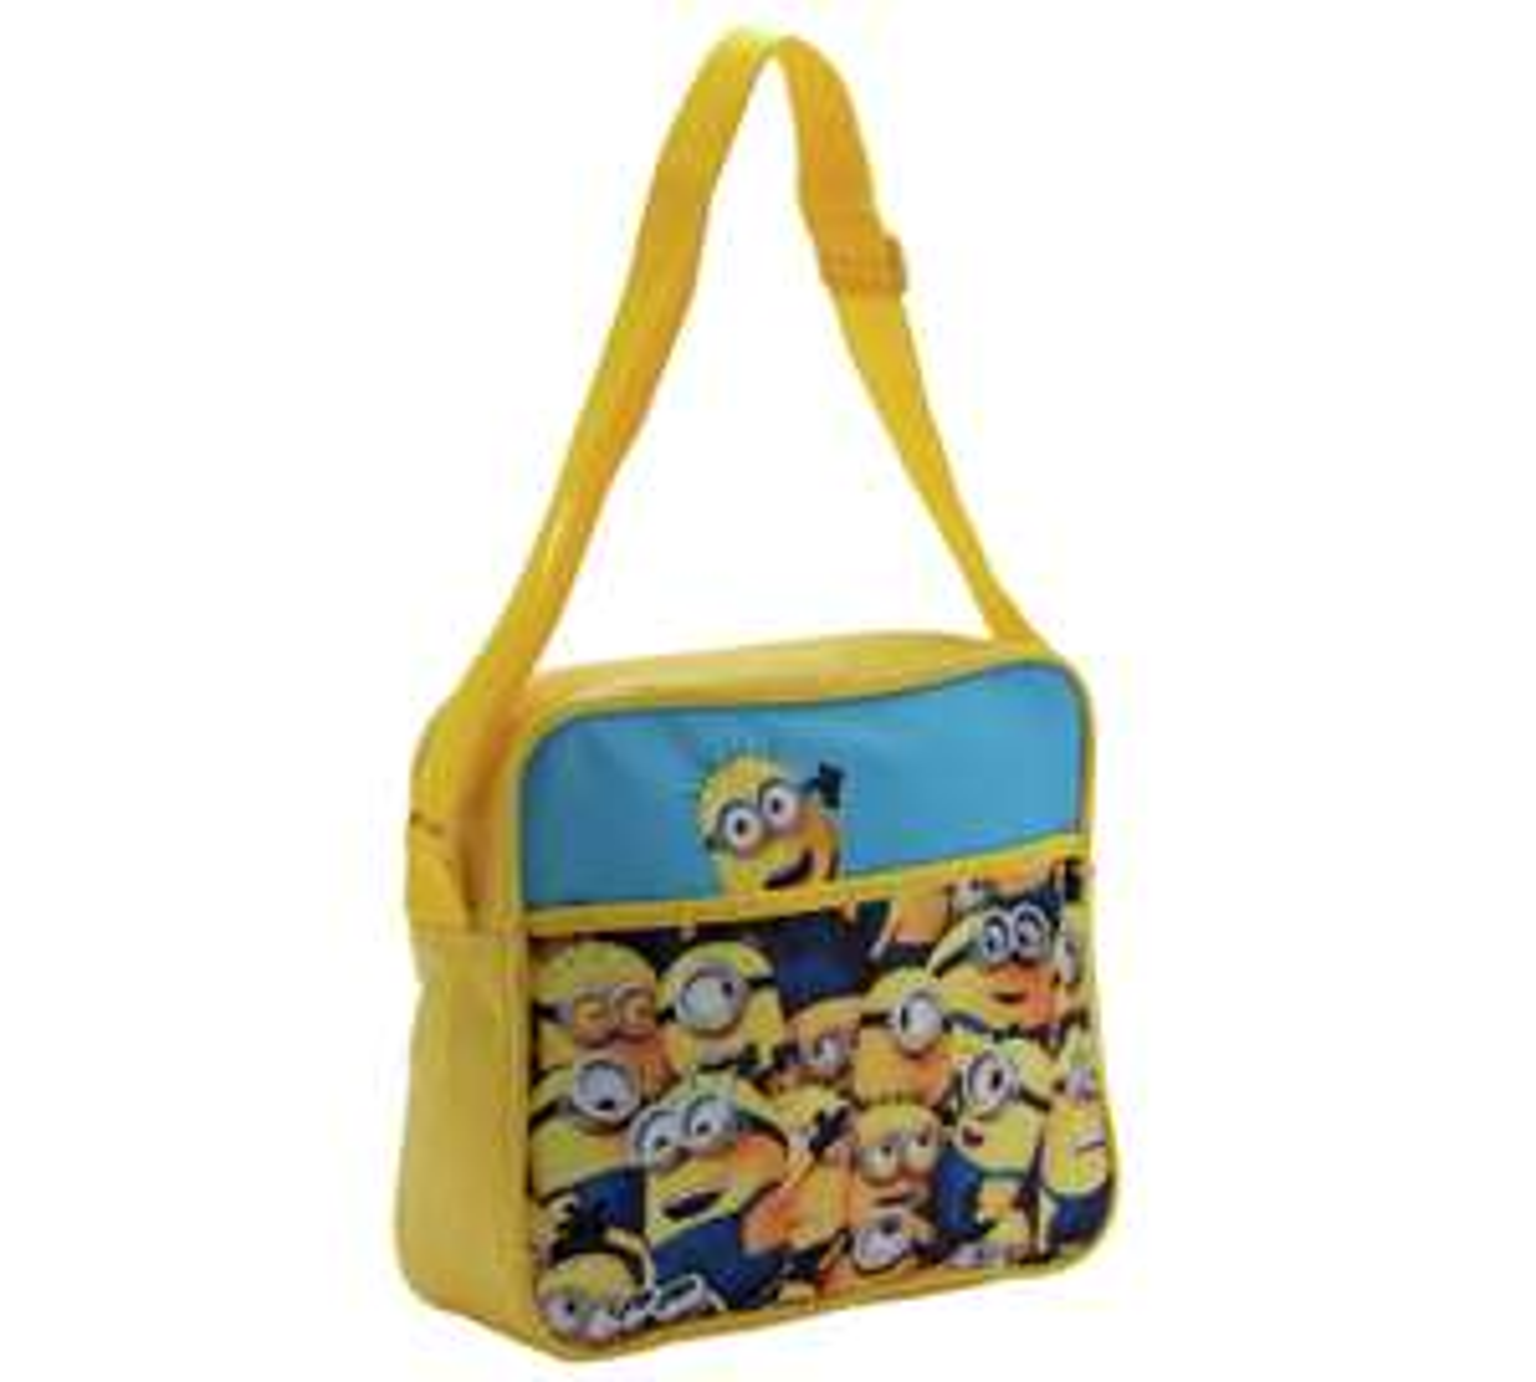 Minions Courier Bag £5.99 @ Argos